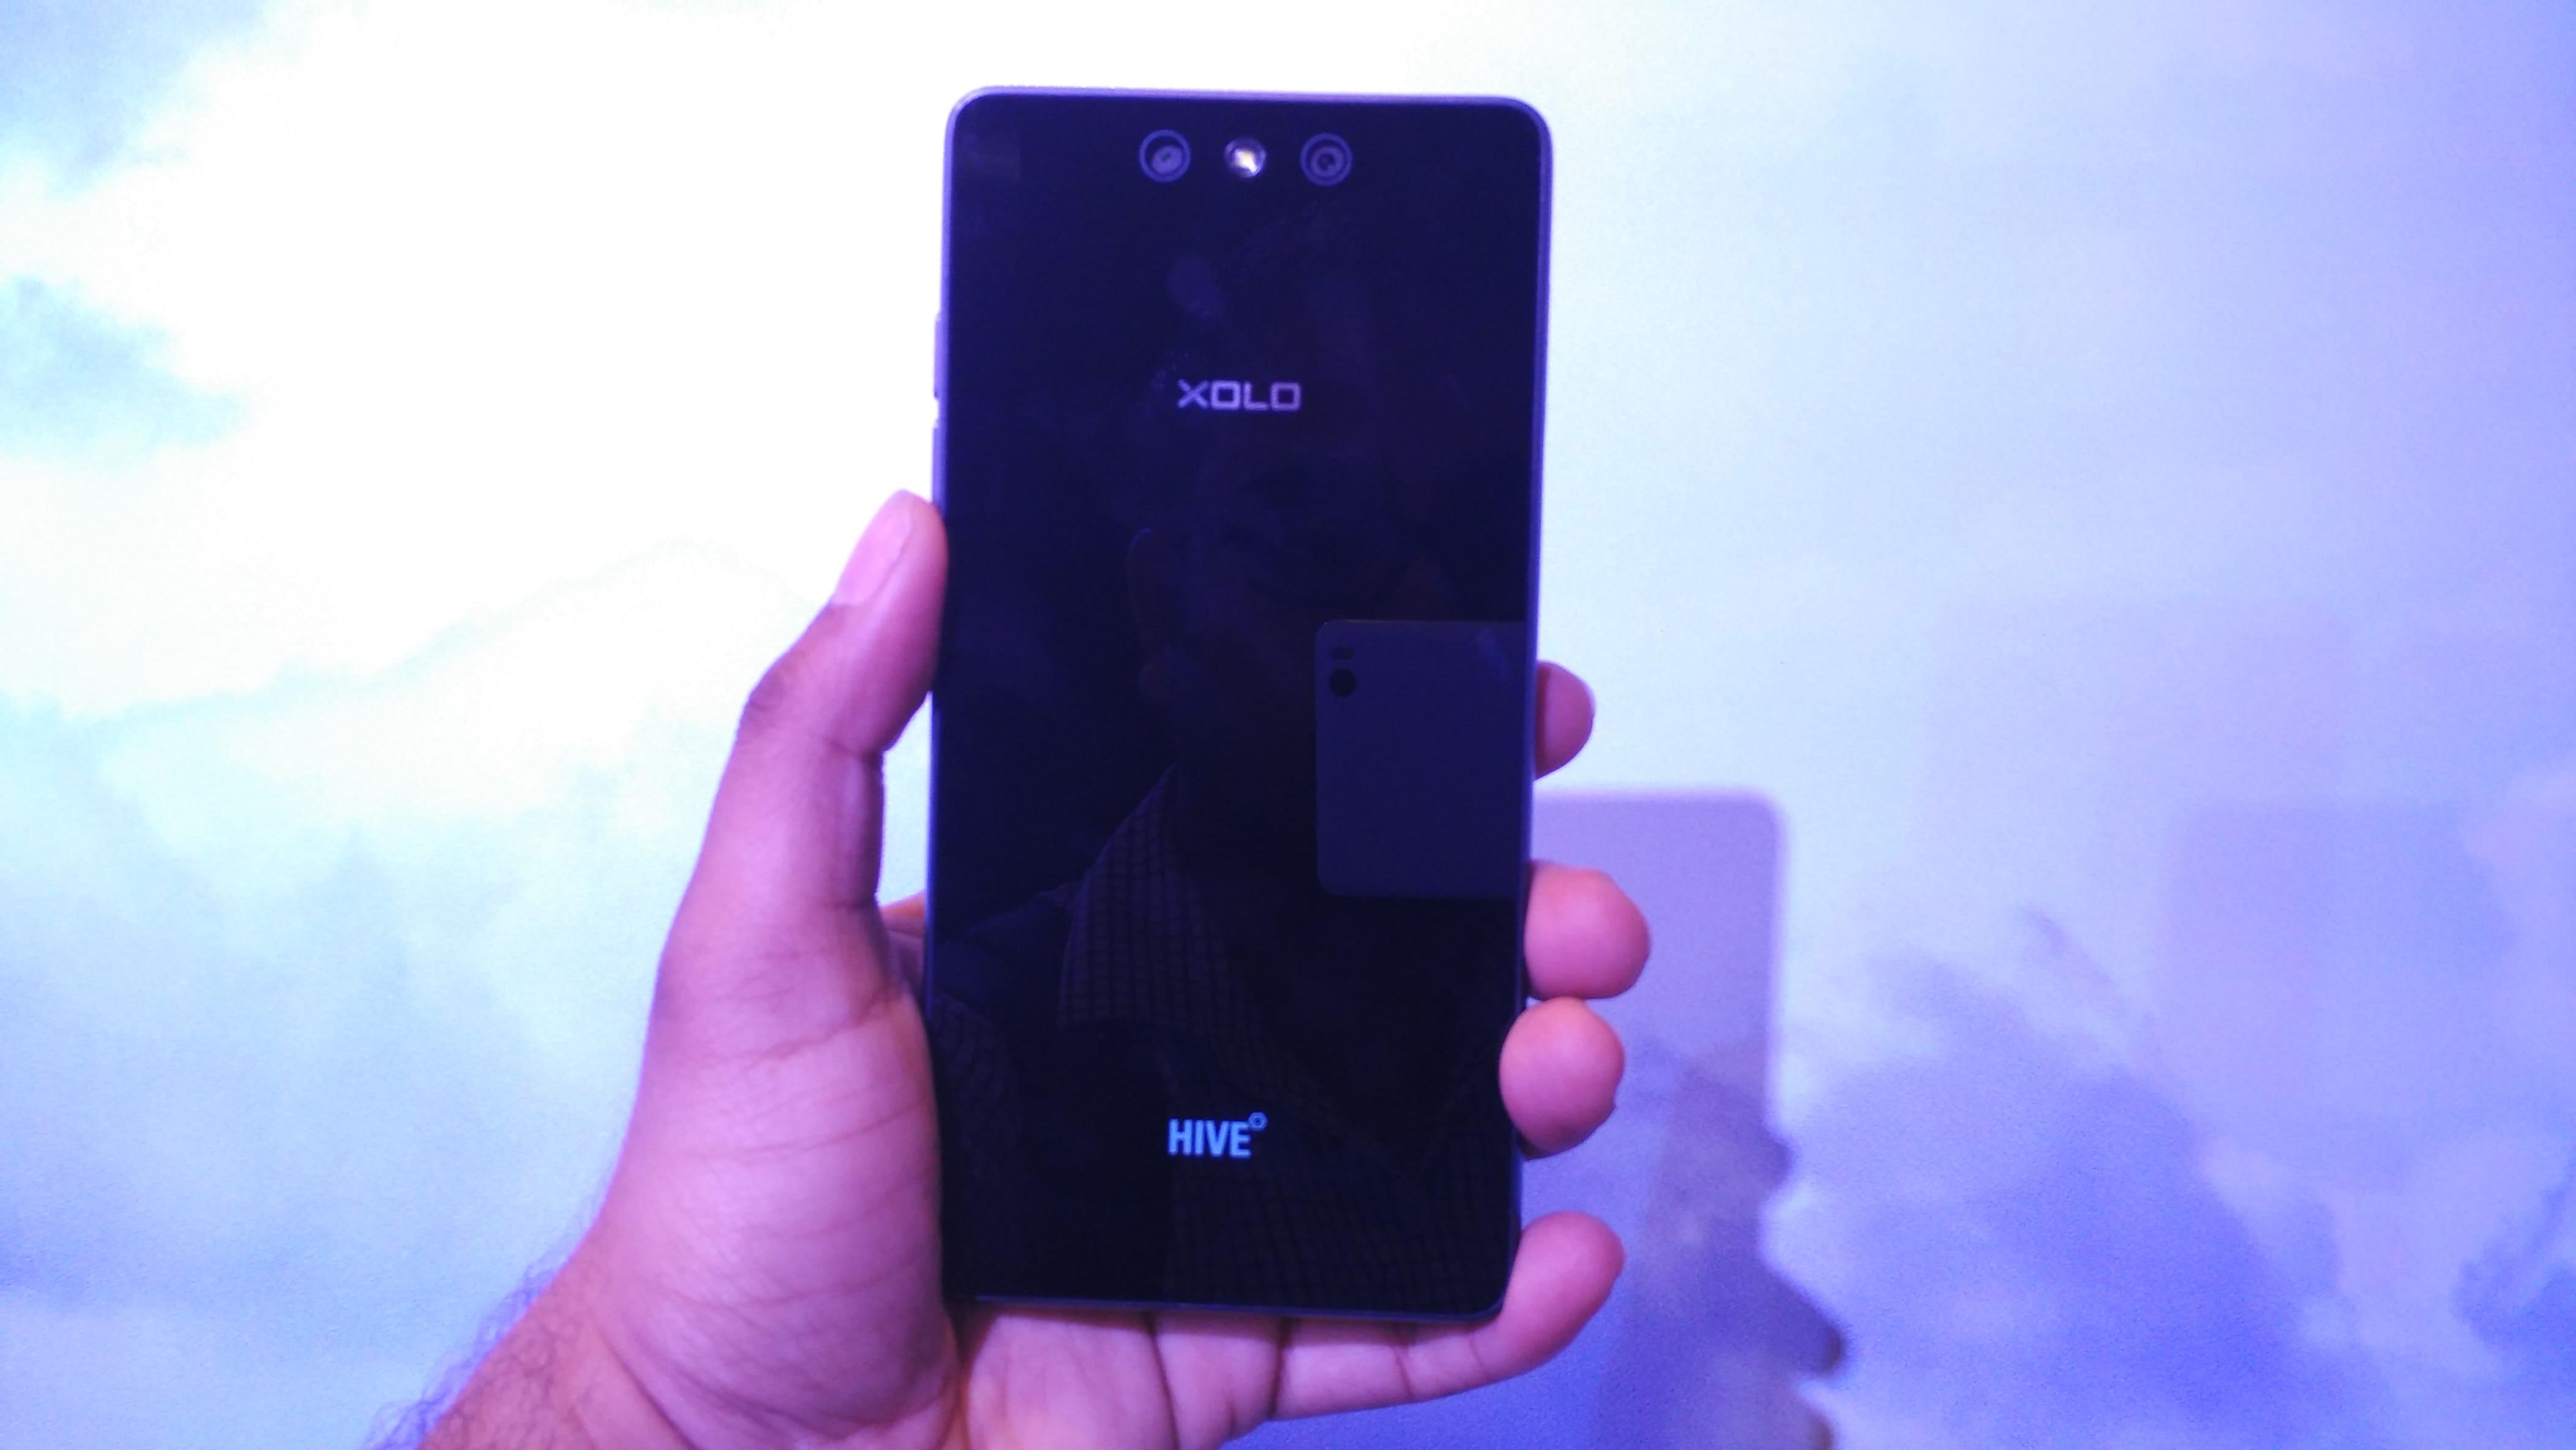 Xolo, Xolo Black, Xolo Black smartphone, Xolo Black specs, Xolo Black pictures, Xolo Black price, Xolo Black Flipkart, smartphones, technology, technology news